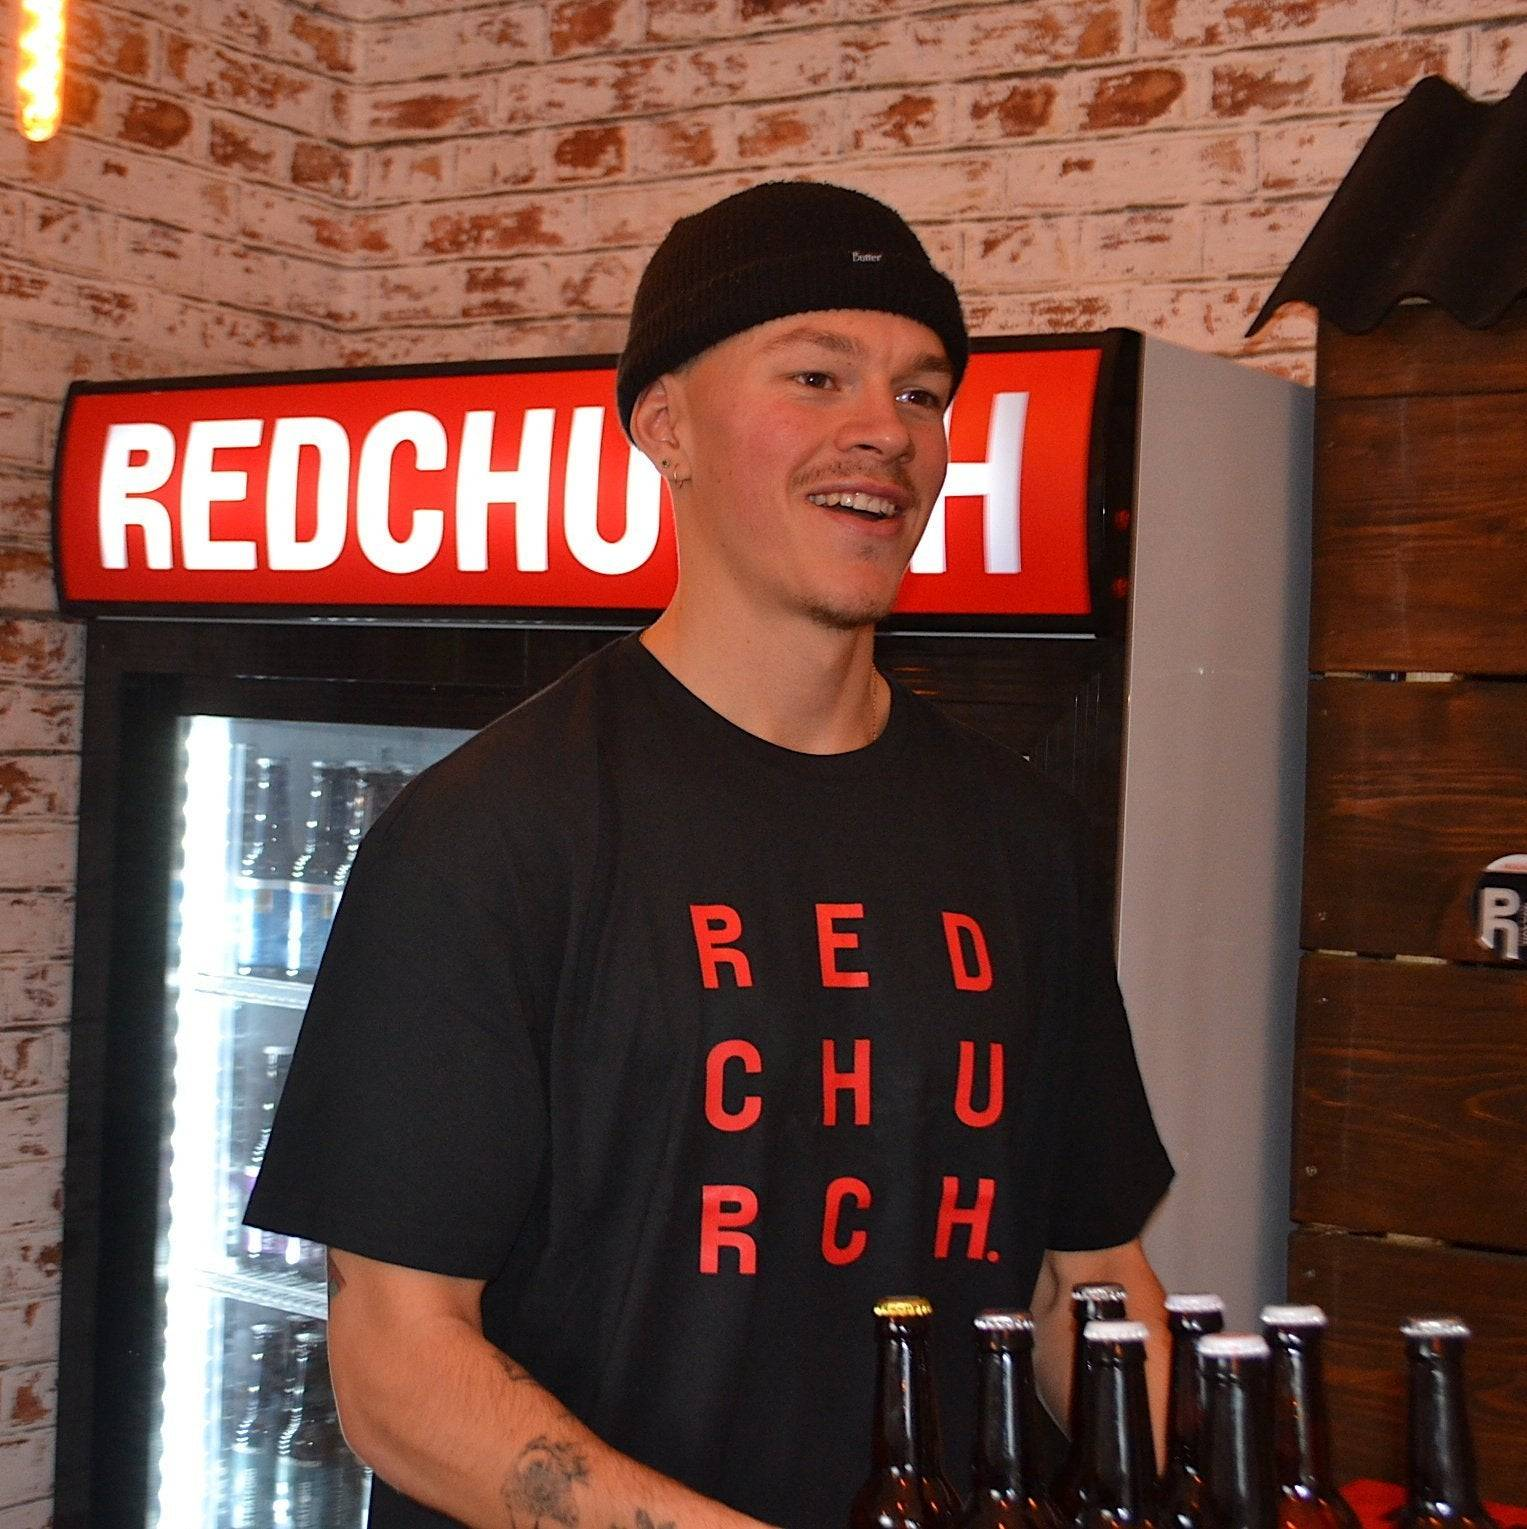 Redchurch Brewery Redchurch 9 Letter T-Shirt - Medium  40-42